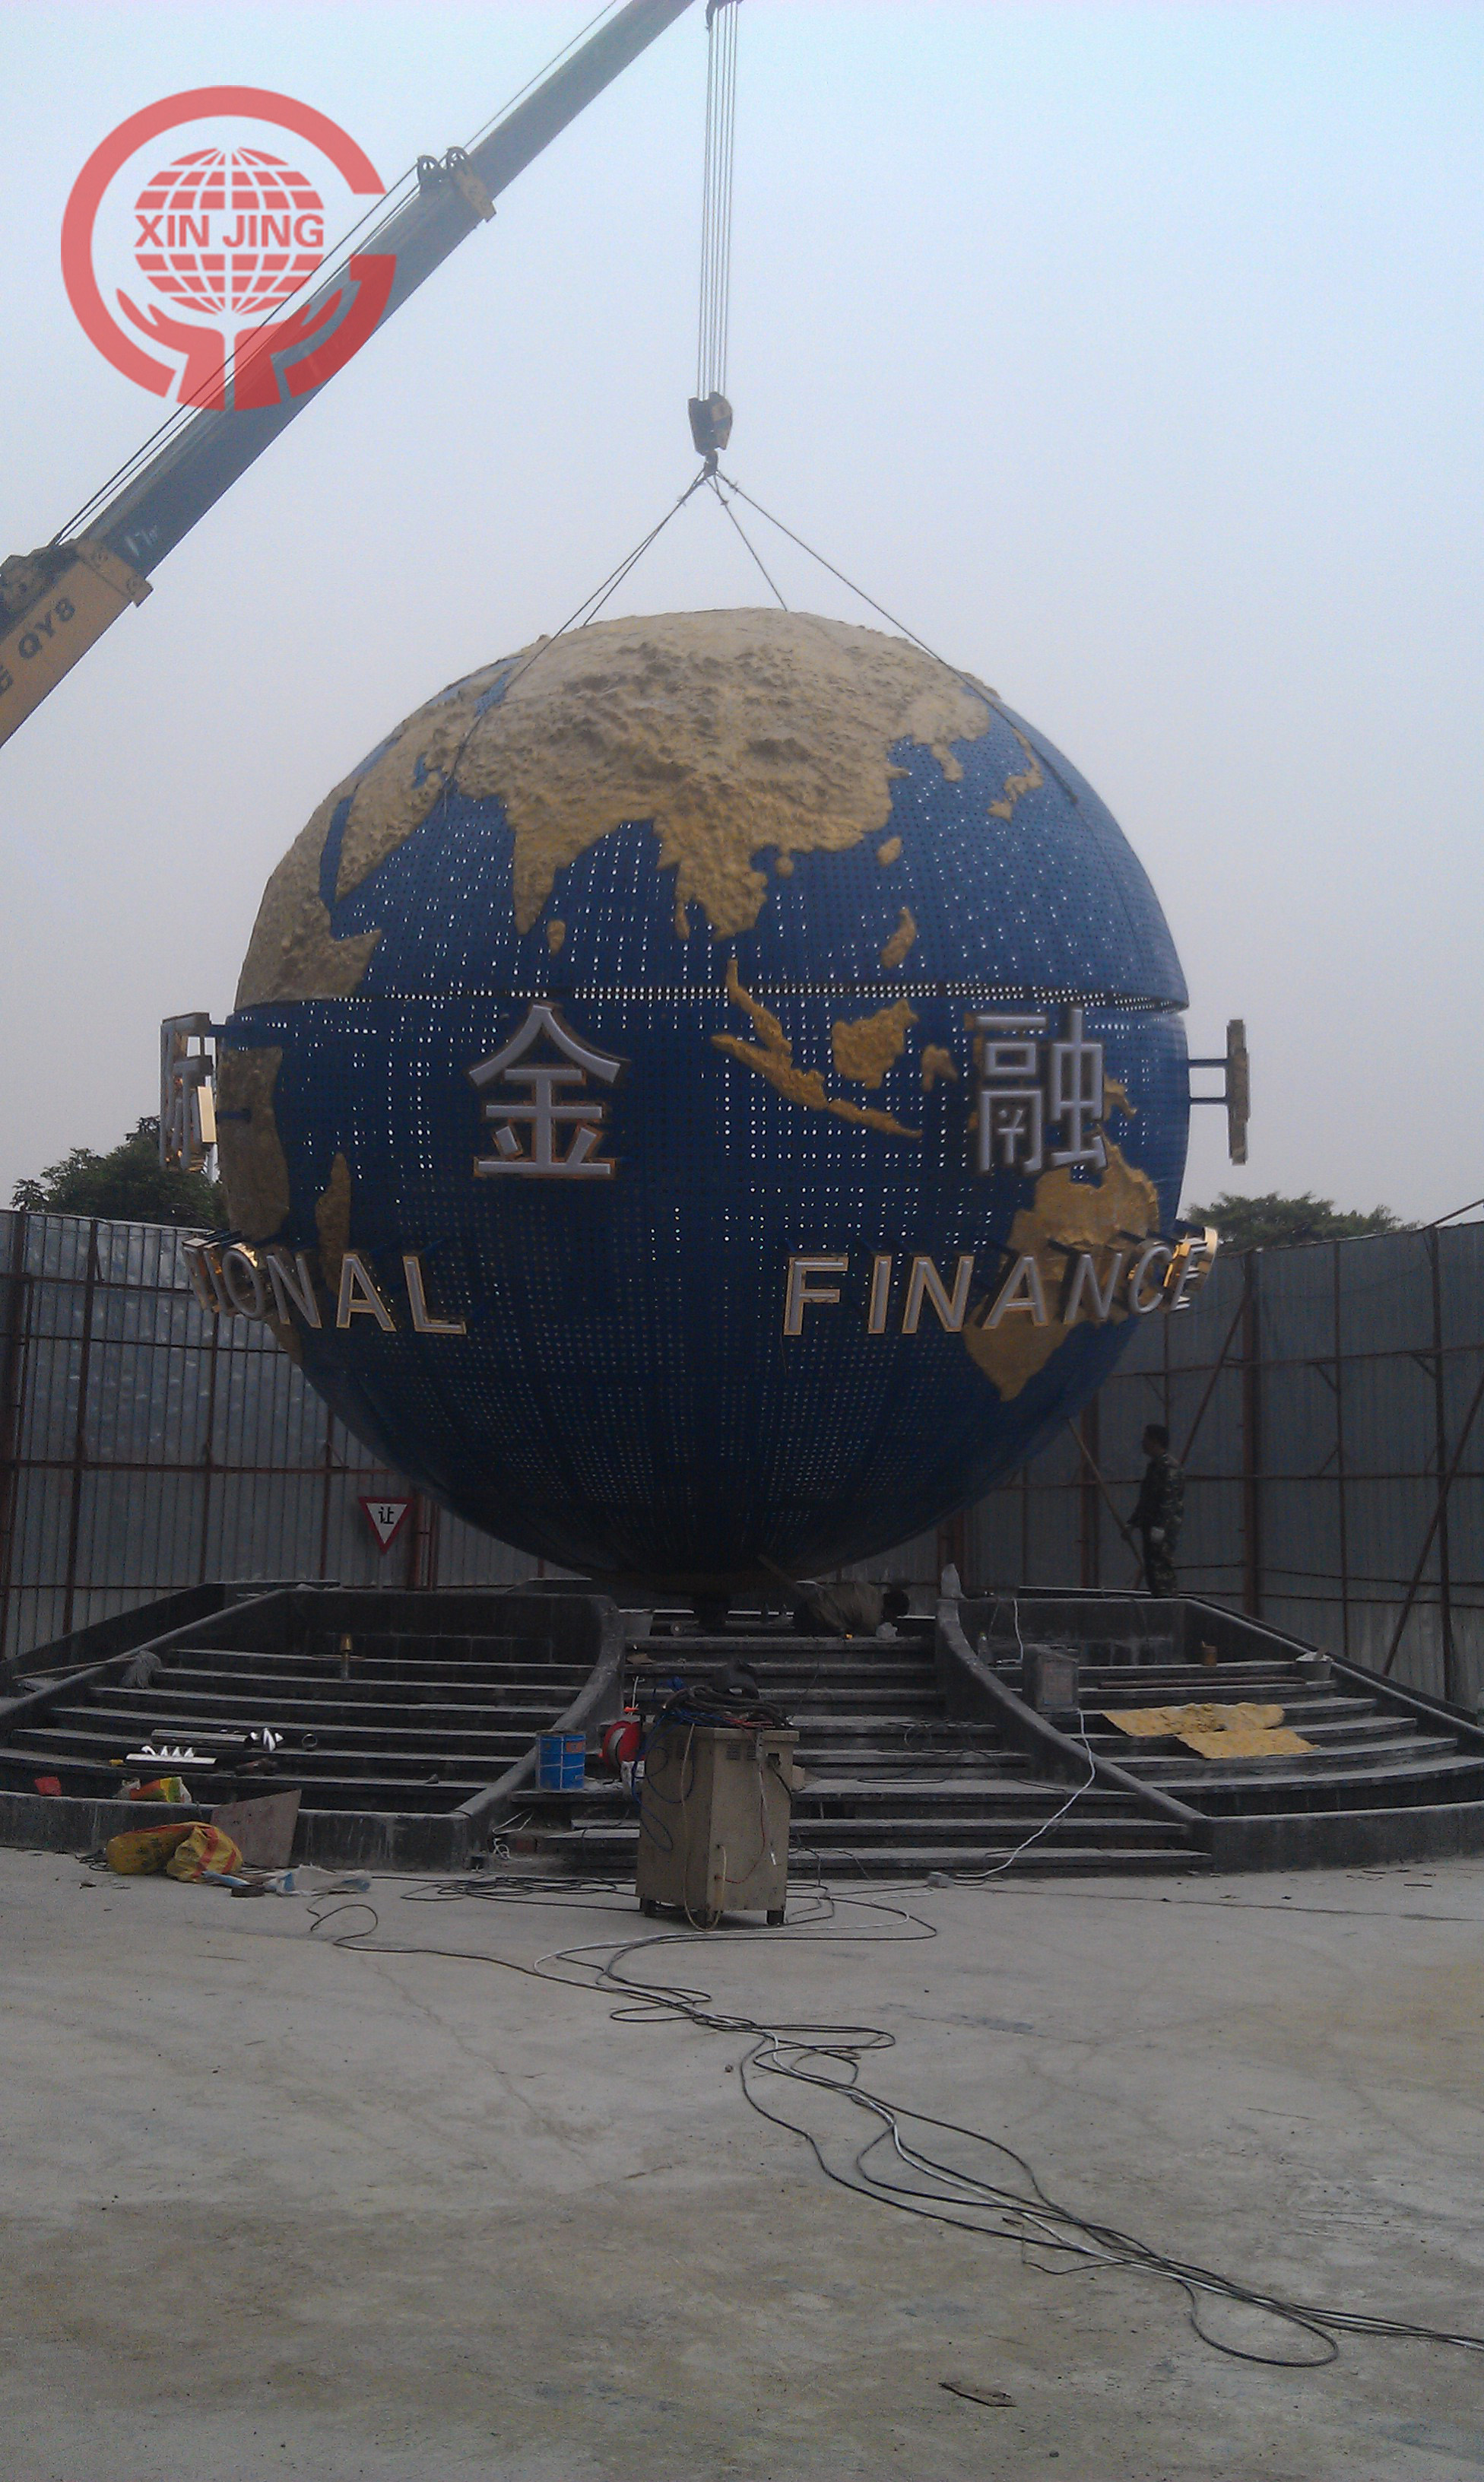 Guangxi Nanning International Financial Center